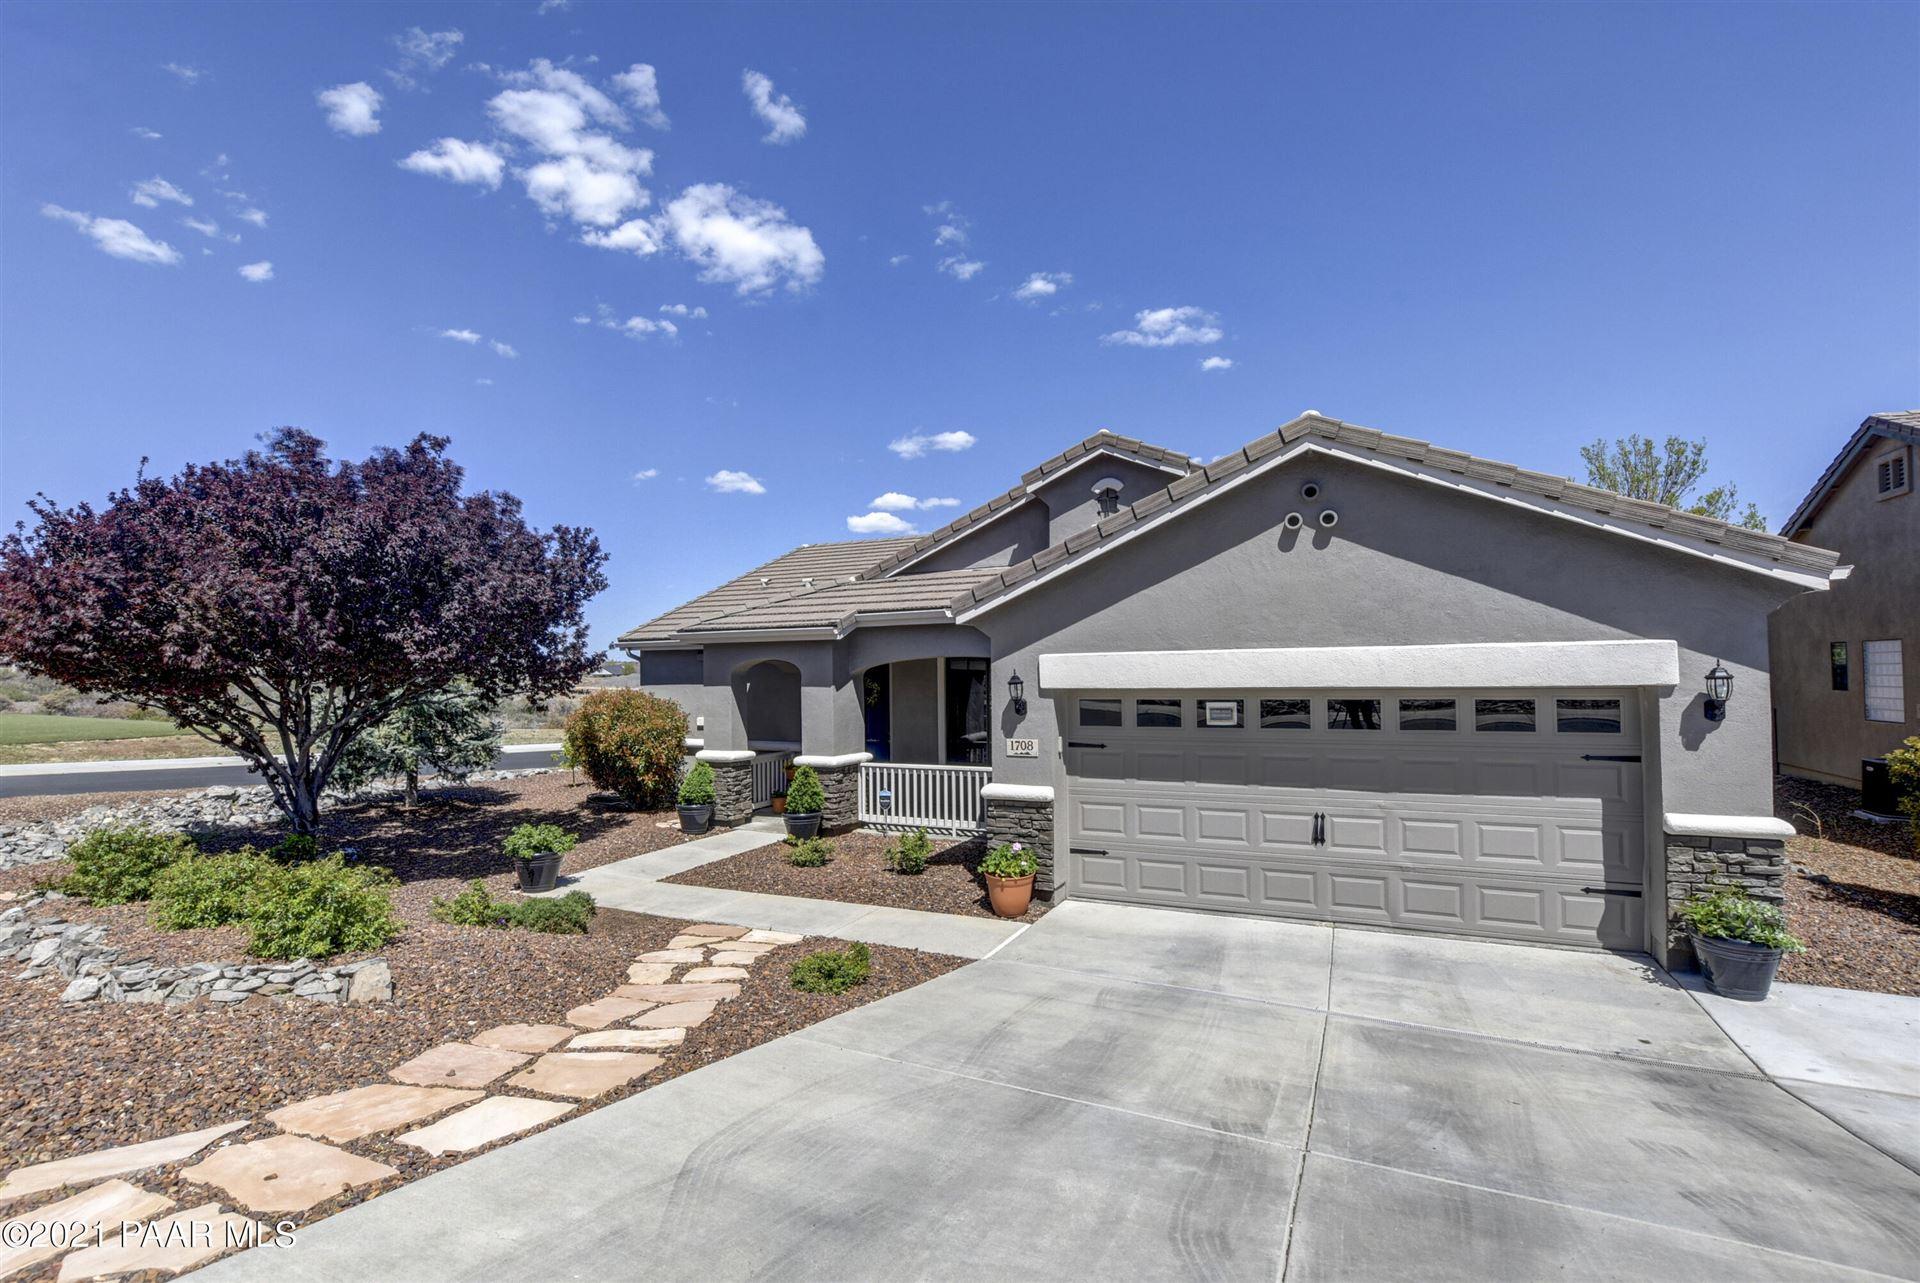 Photo of 1708 Juliana Street #Lot: 22, Prescott, AZ 86301 (MLS # 1037605)